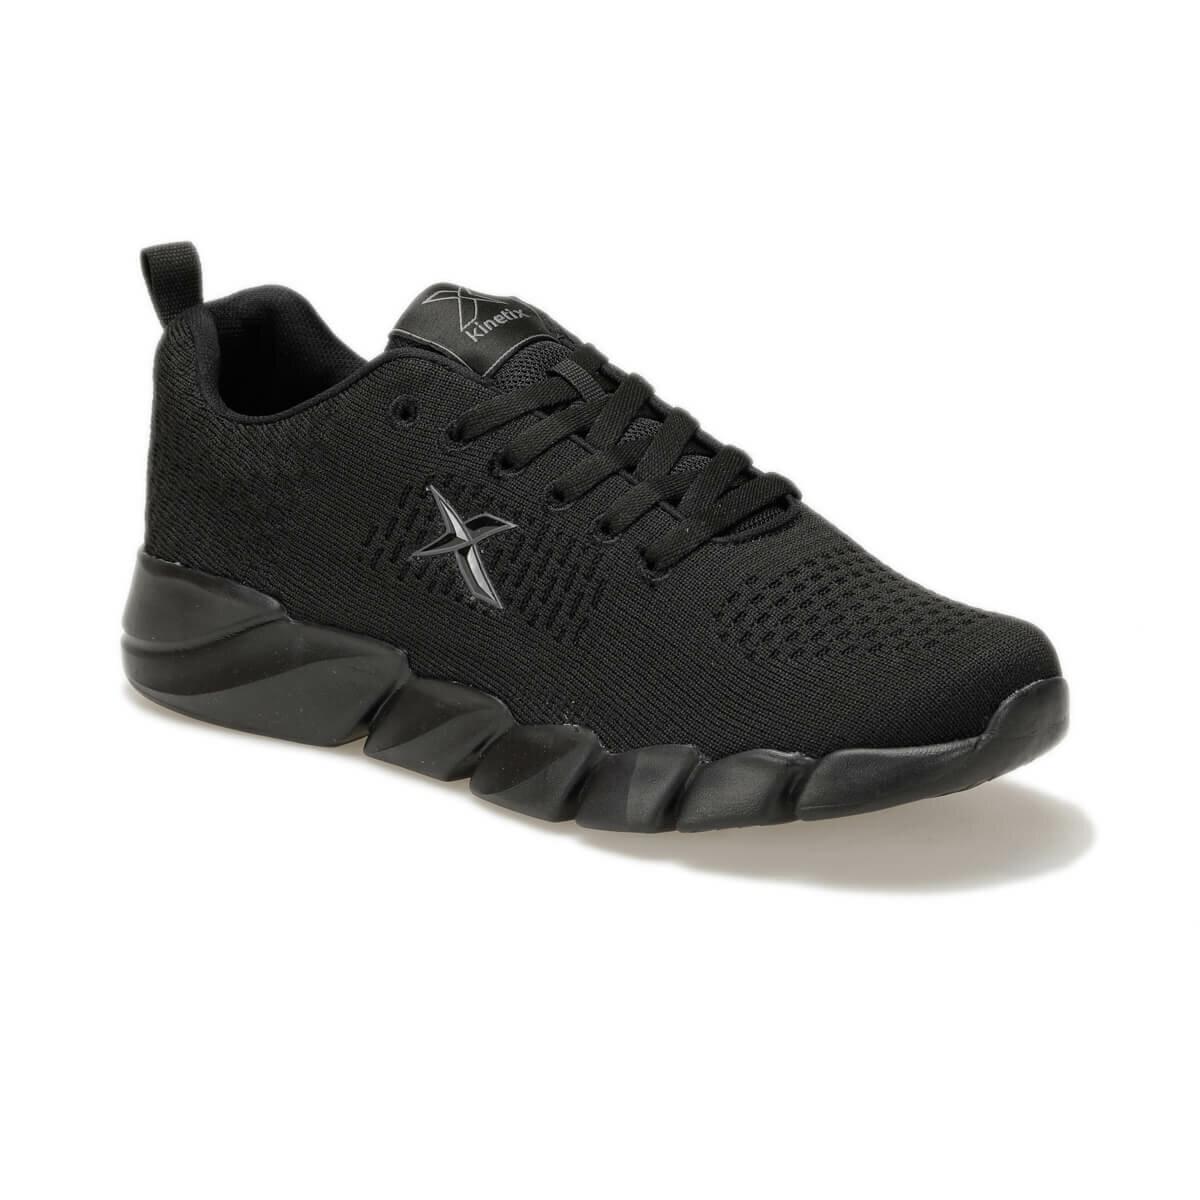 FLO NOTUS Black Men 'S Fitness Shoes KINETIX